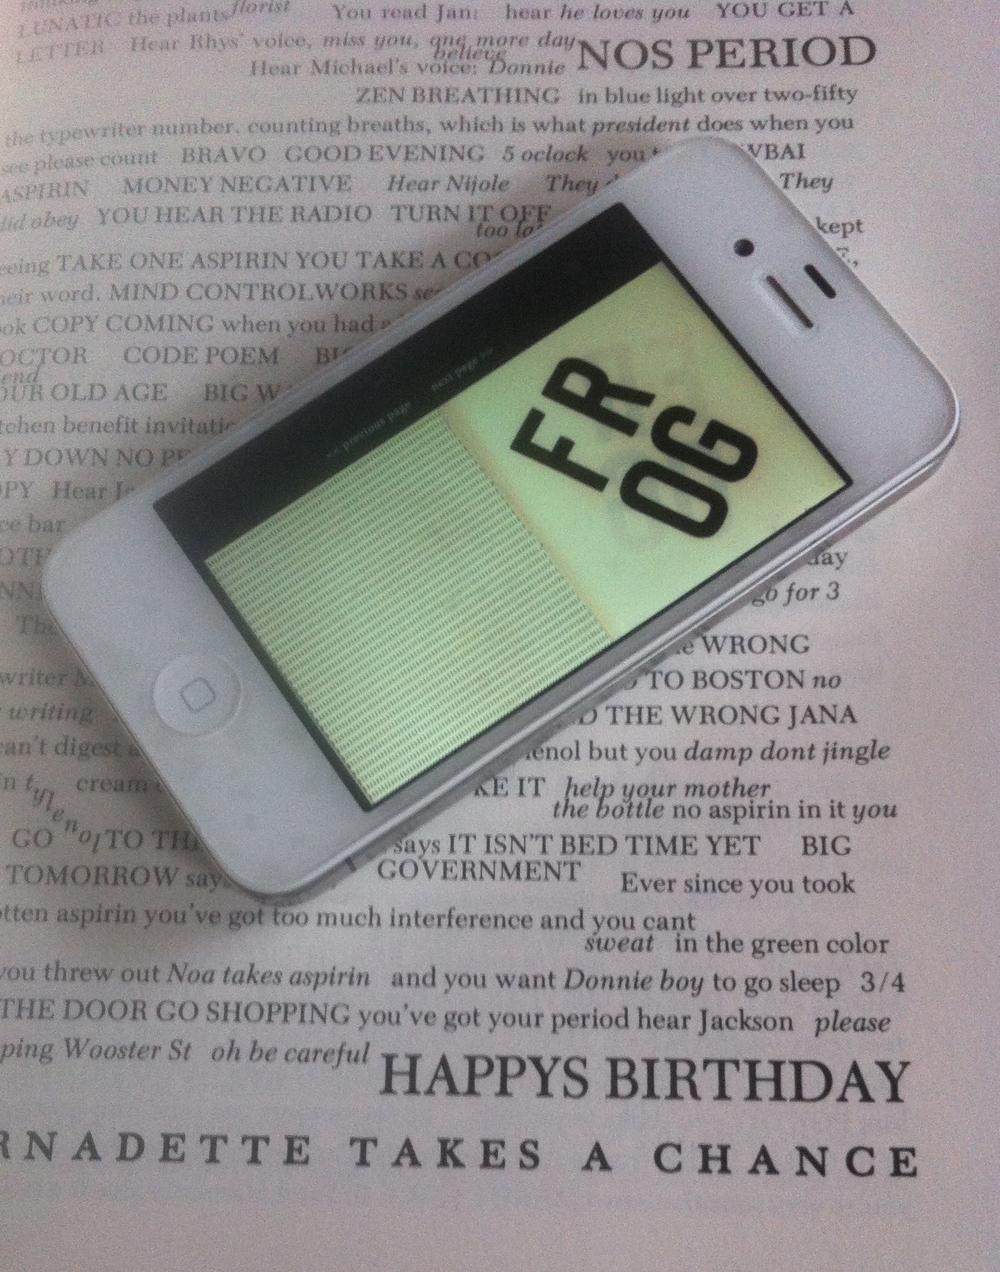 textphone.jpg